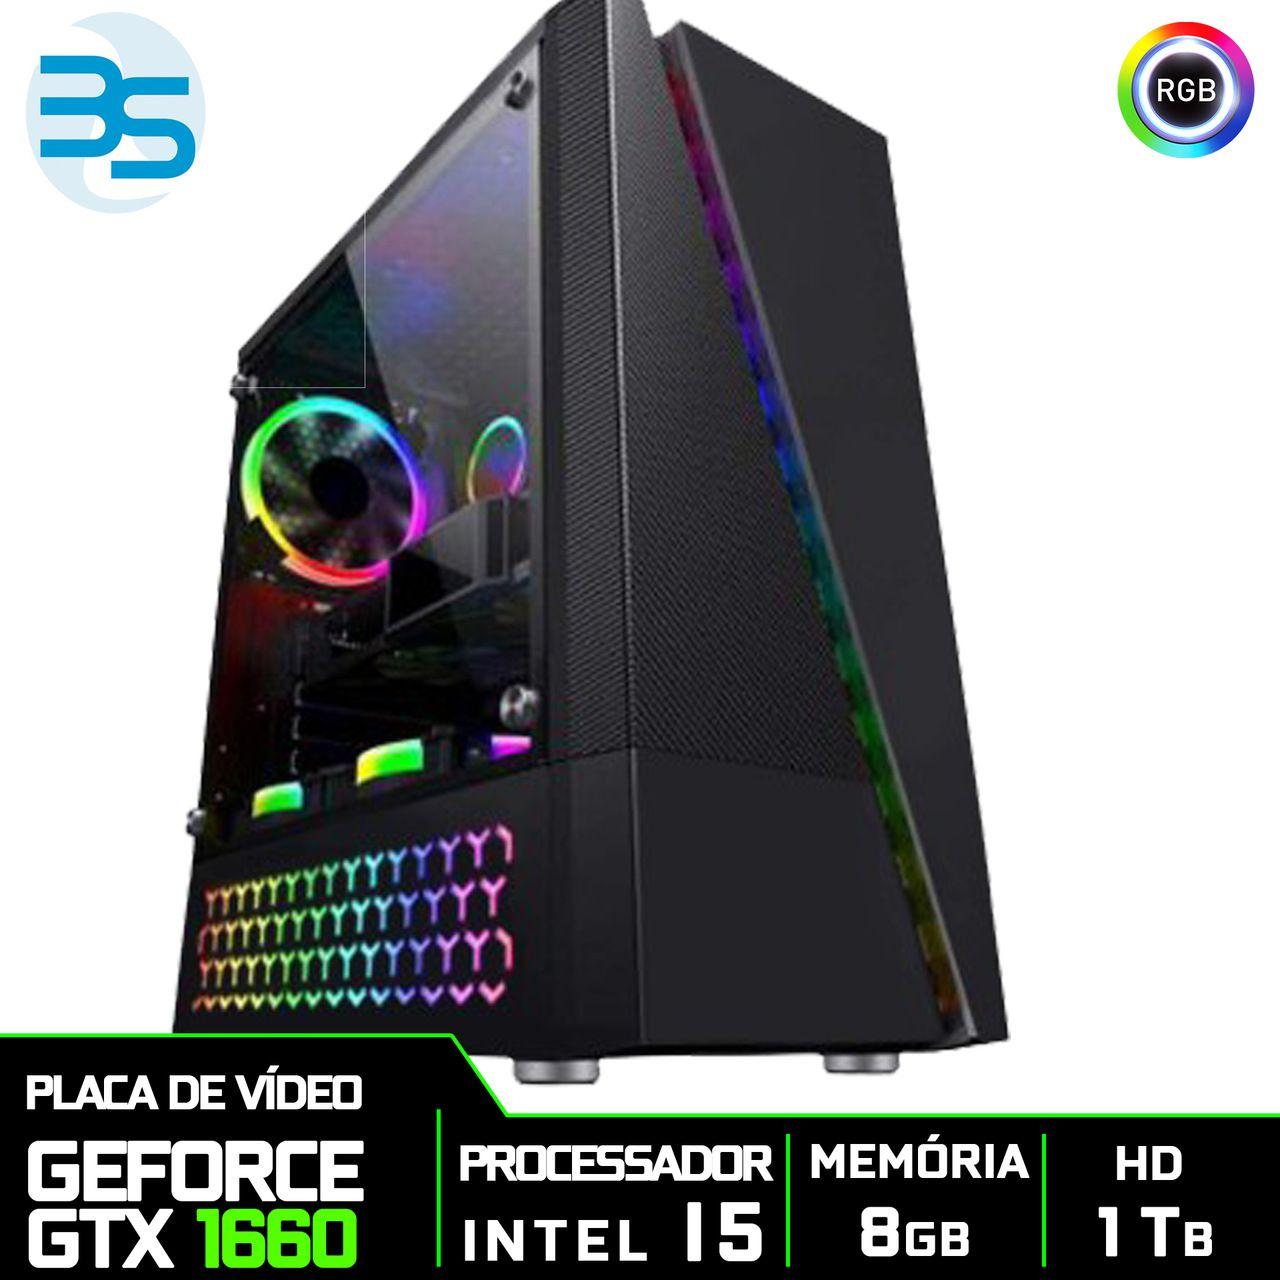 Bs Gamer Intel I5 9400F 2.9GHZ 9MB, 8GB DDR4, HD 1TB, 500W, GTX 1660 6GB